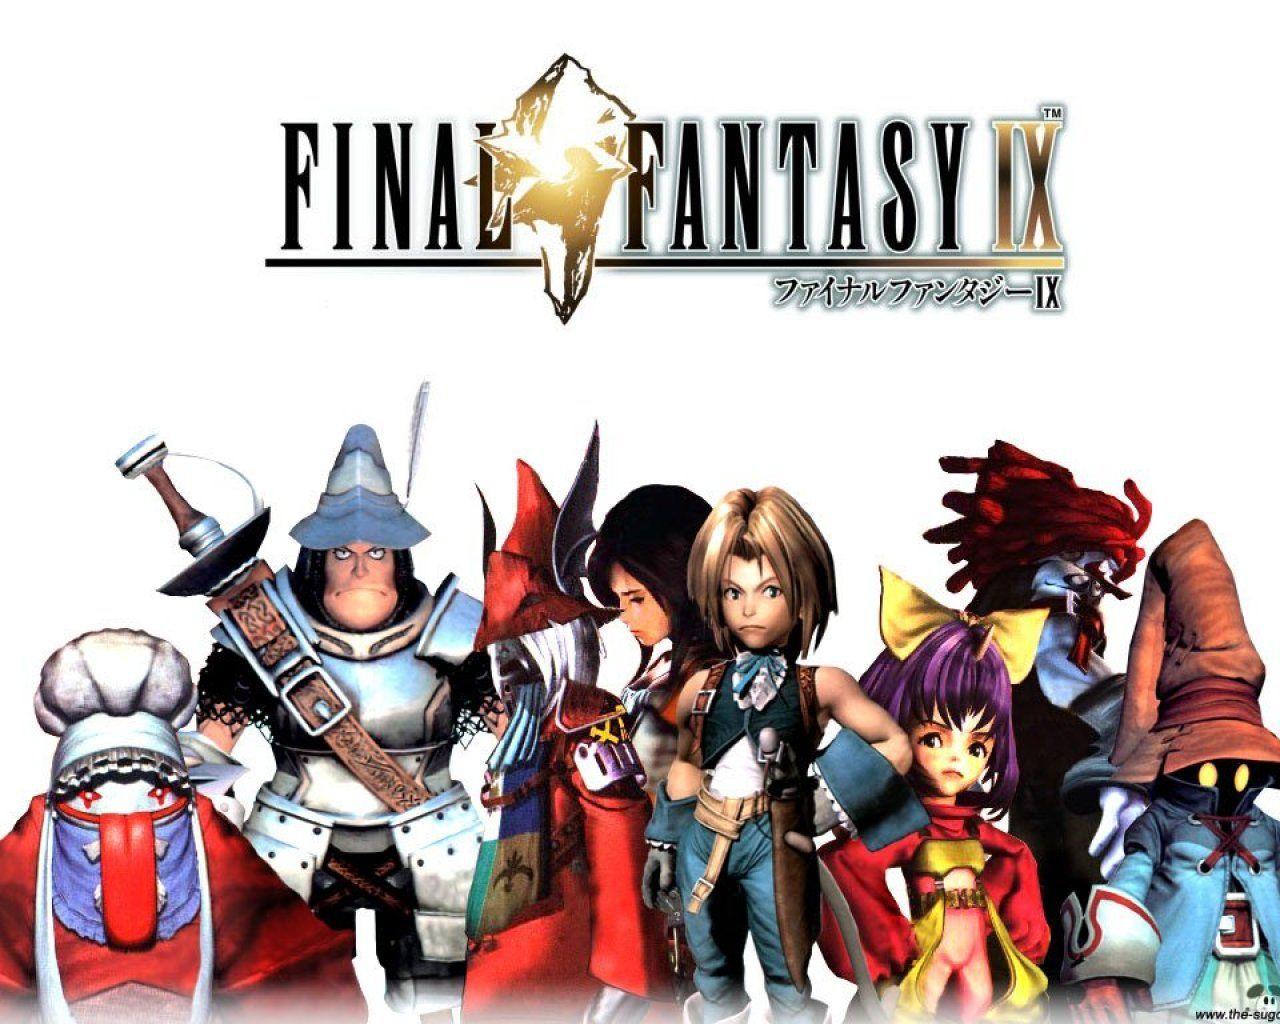 7031 - ¿Cuánto sabes de Final Fantasy 9?